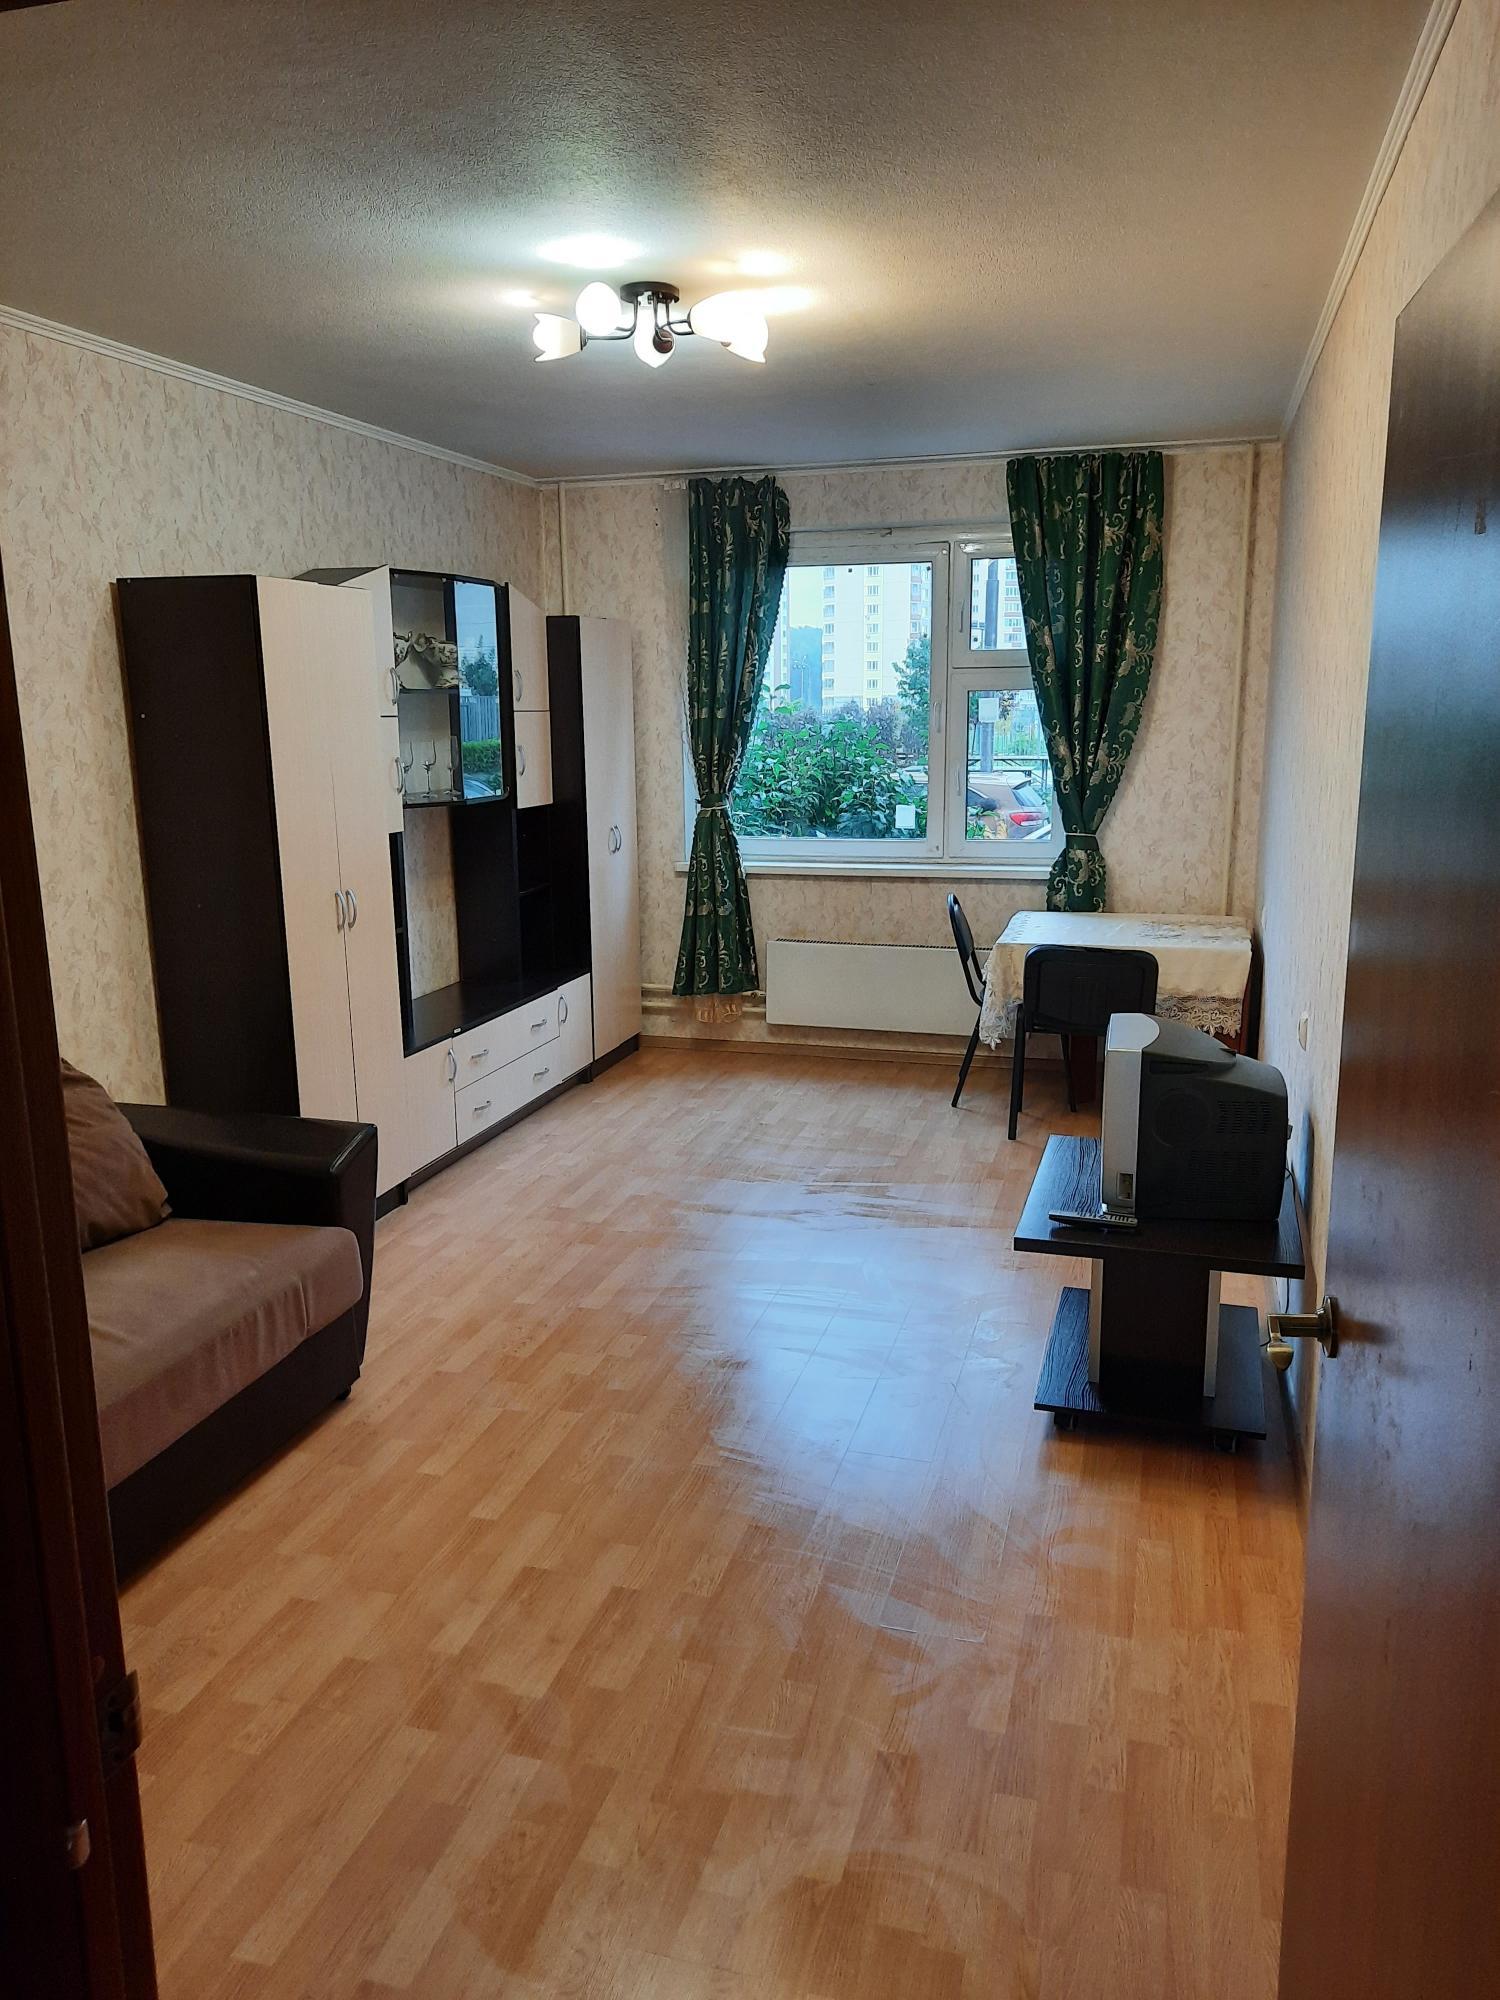 Квартира, 2 комнаты, 61 м² 89269689212 купить 8